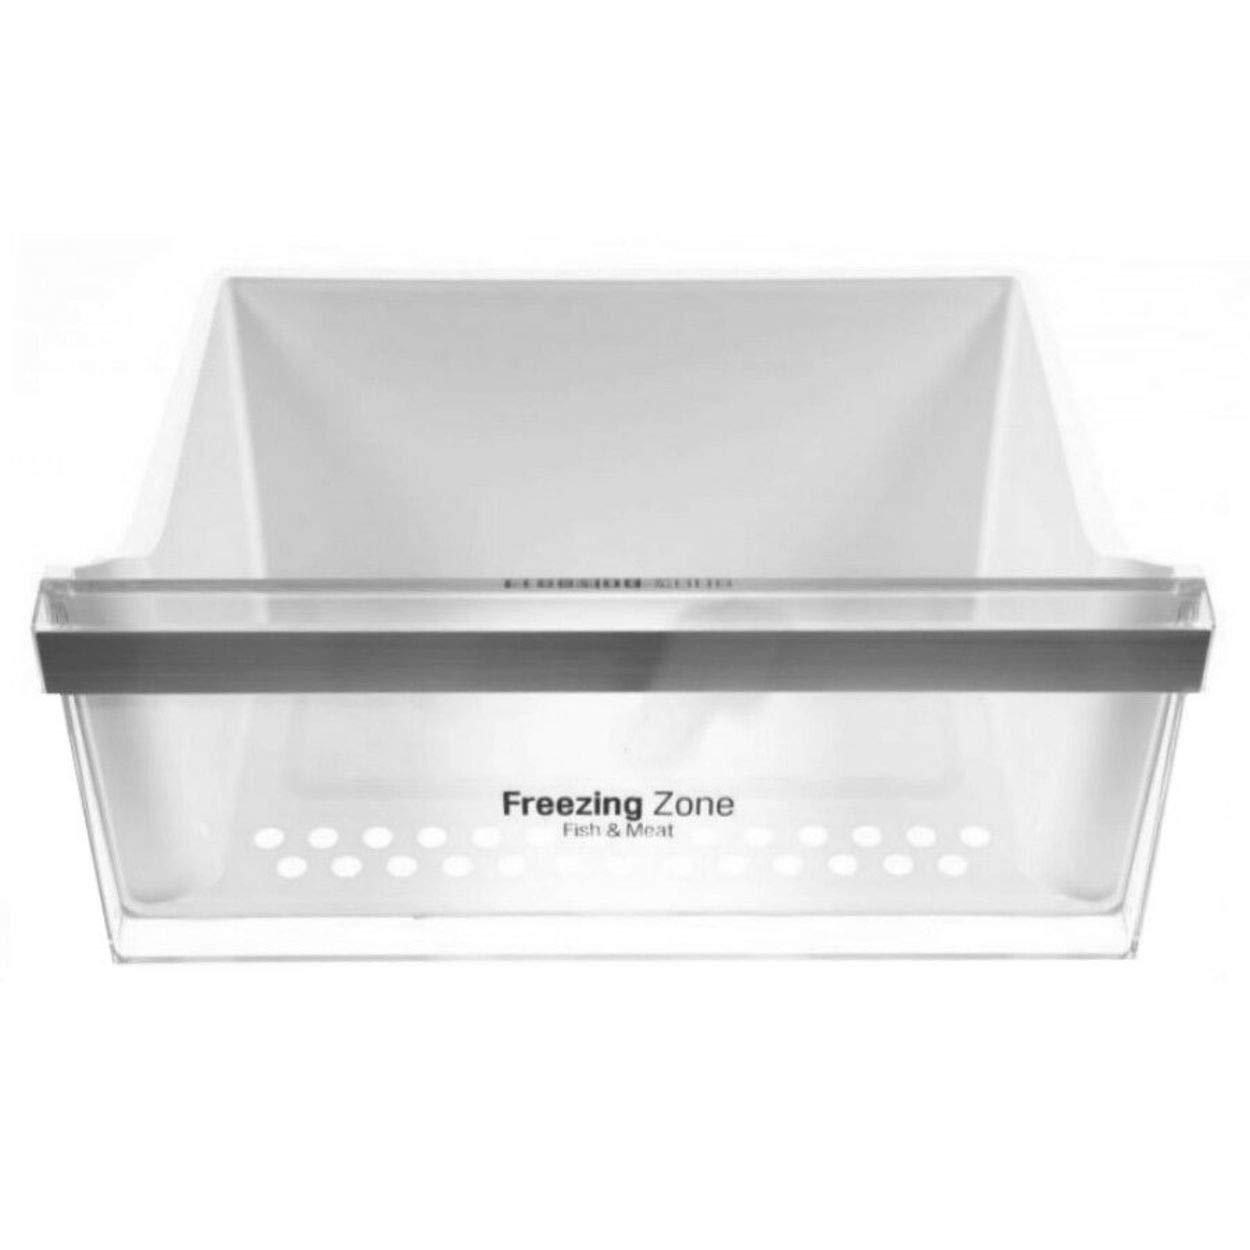 Cajón inferior de congelador LG Original,